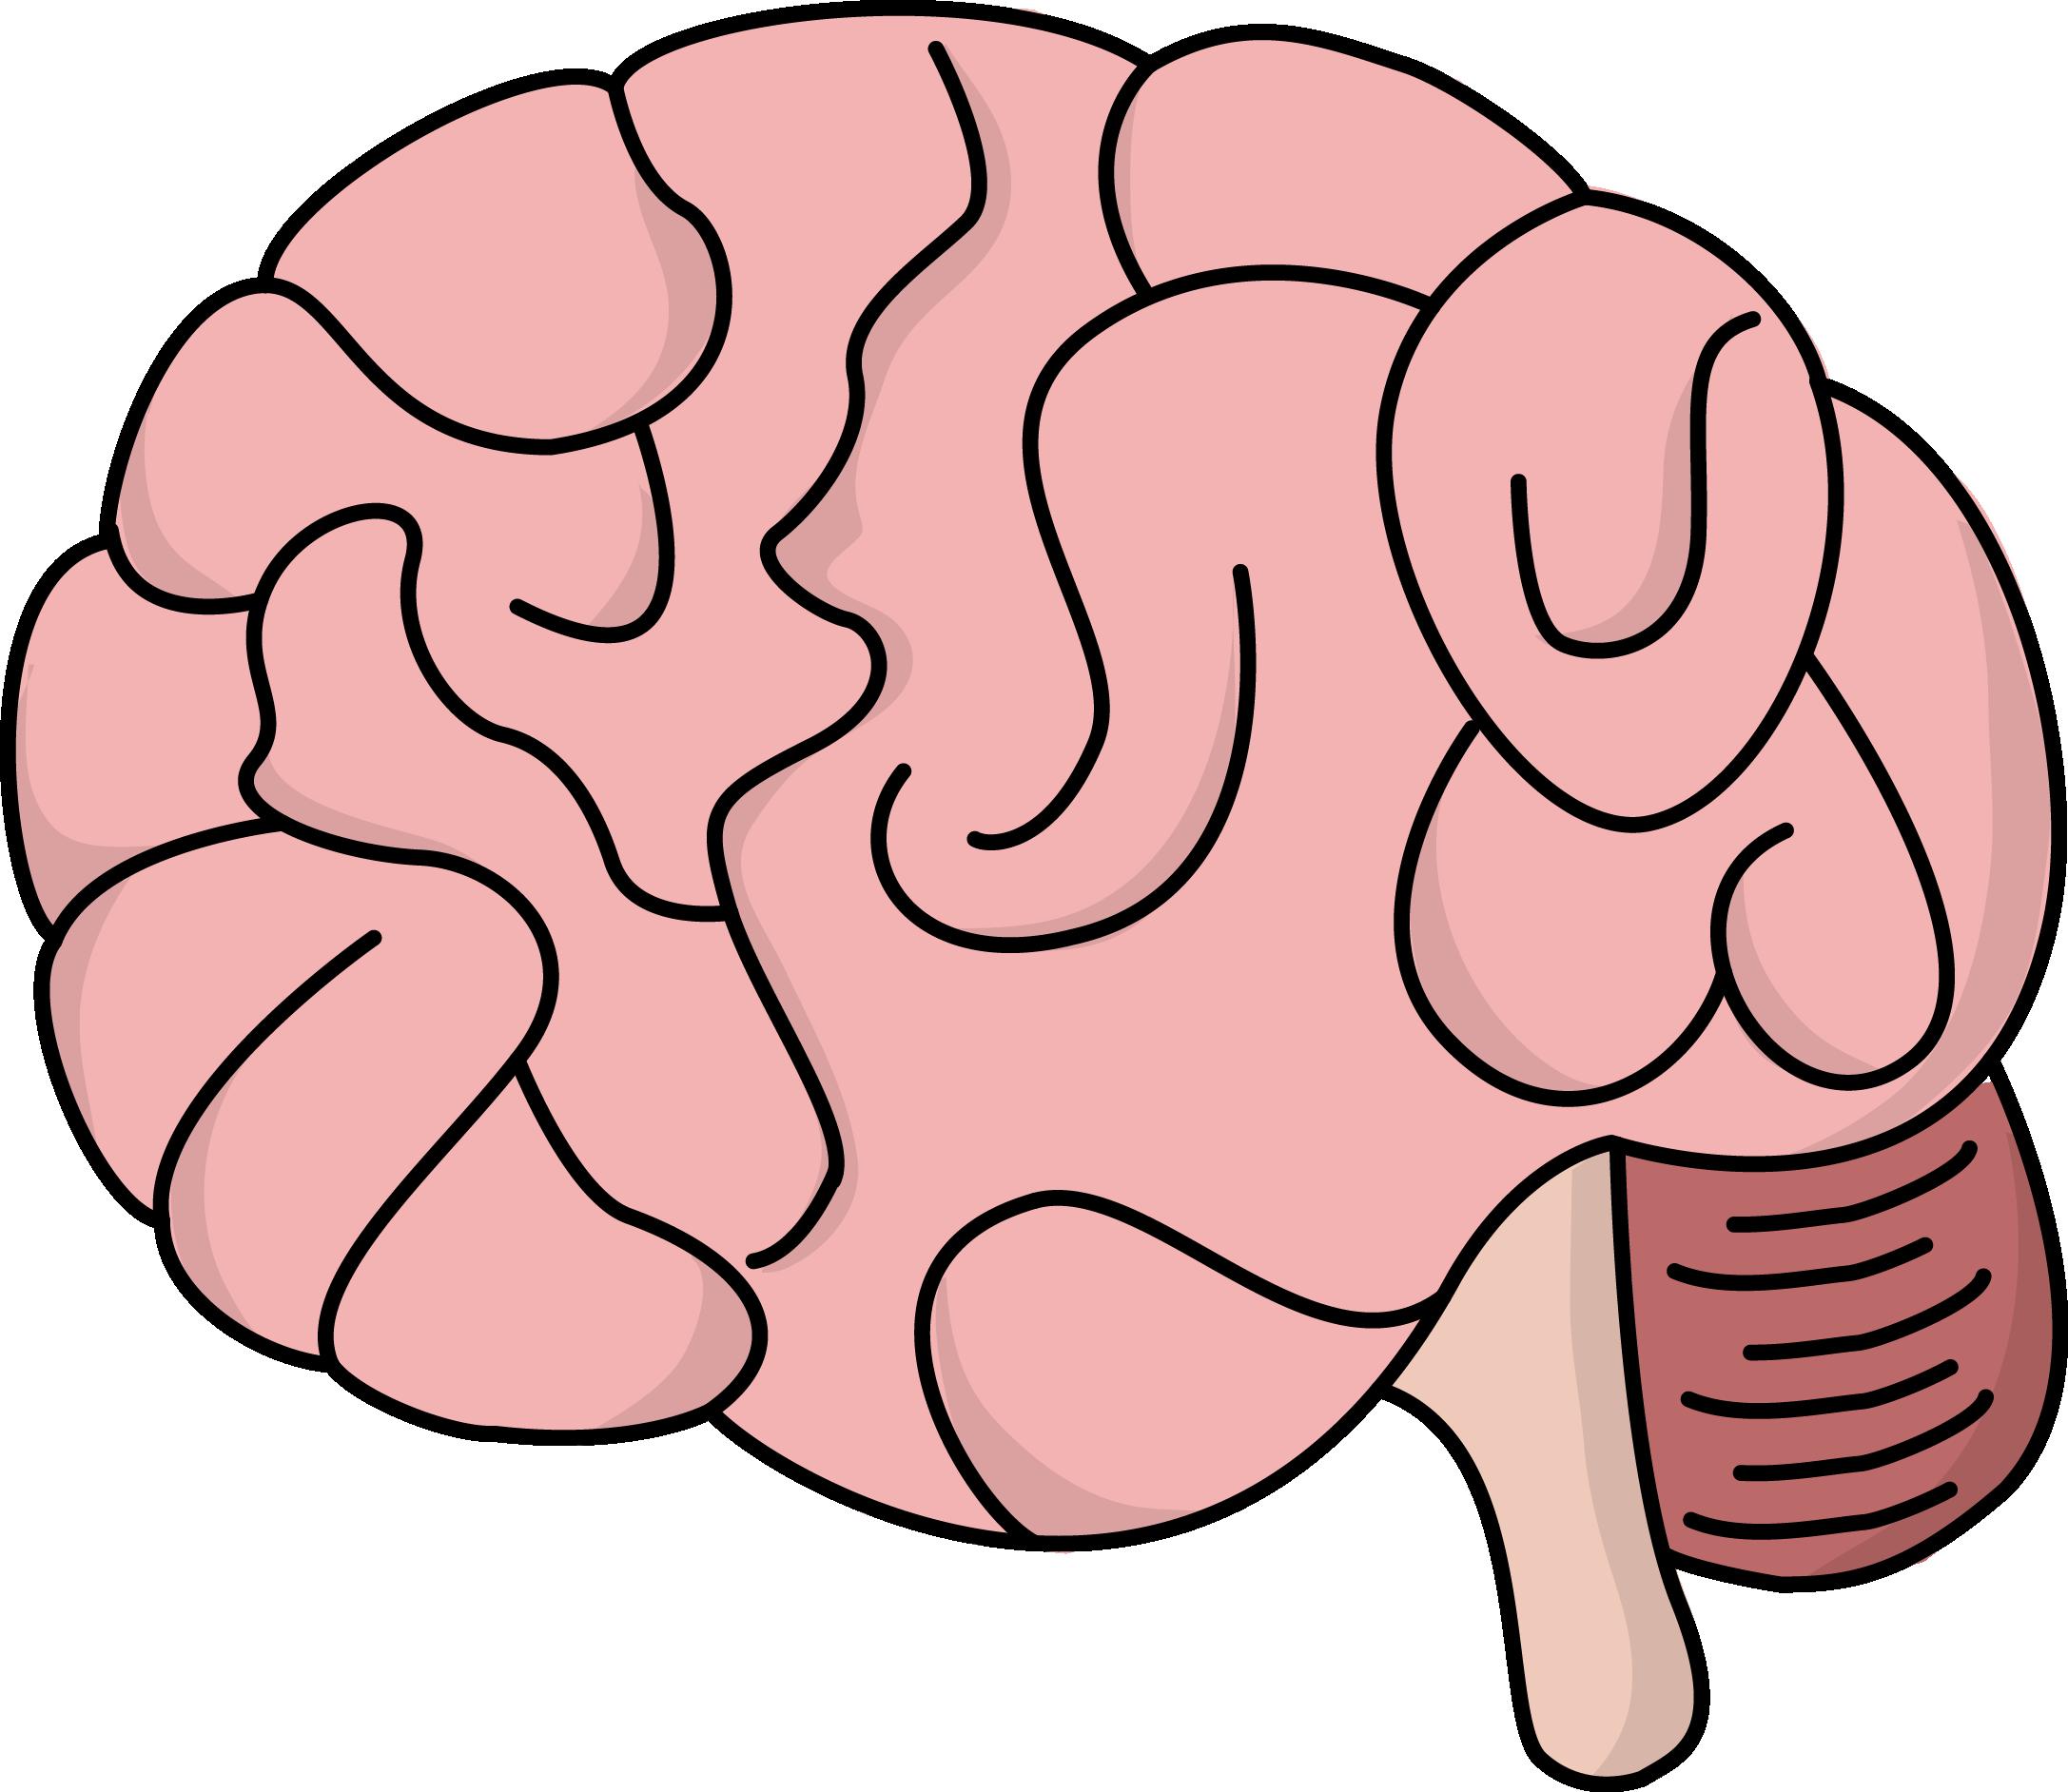 Image for free brain health high resolution clip art.